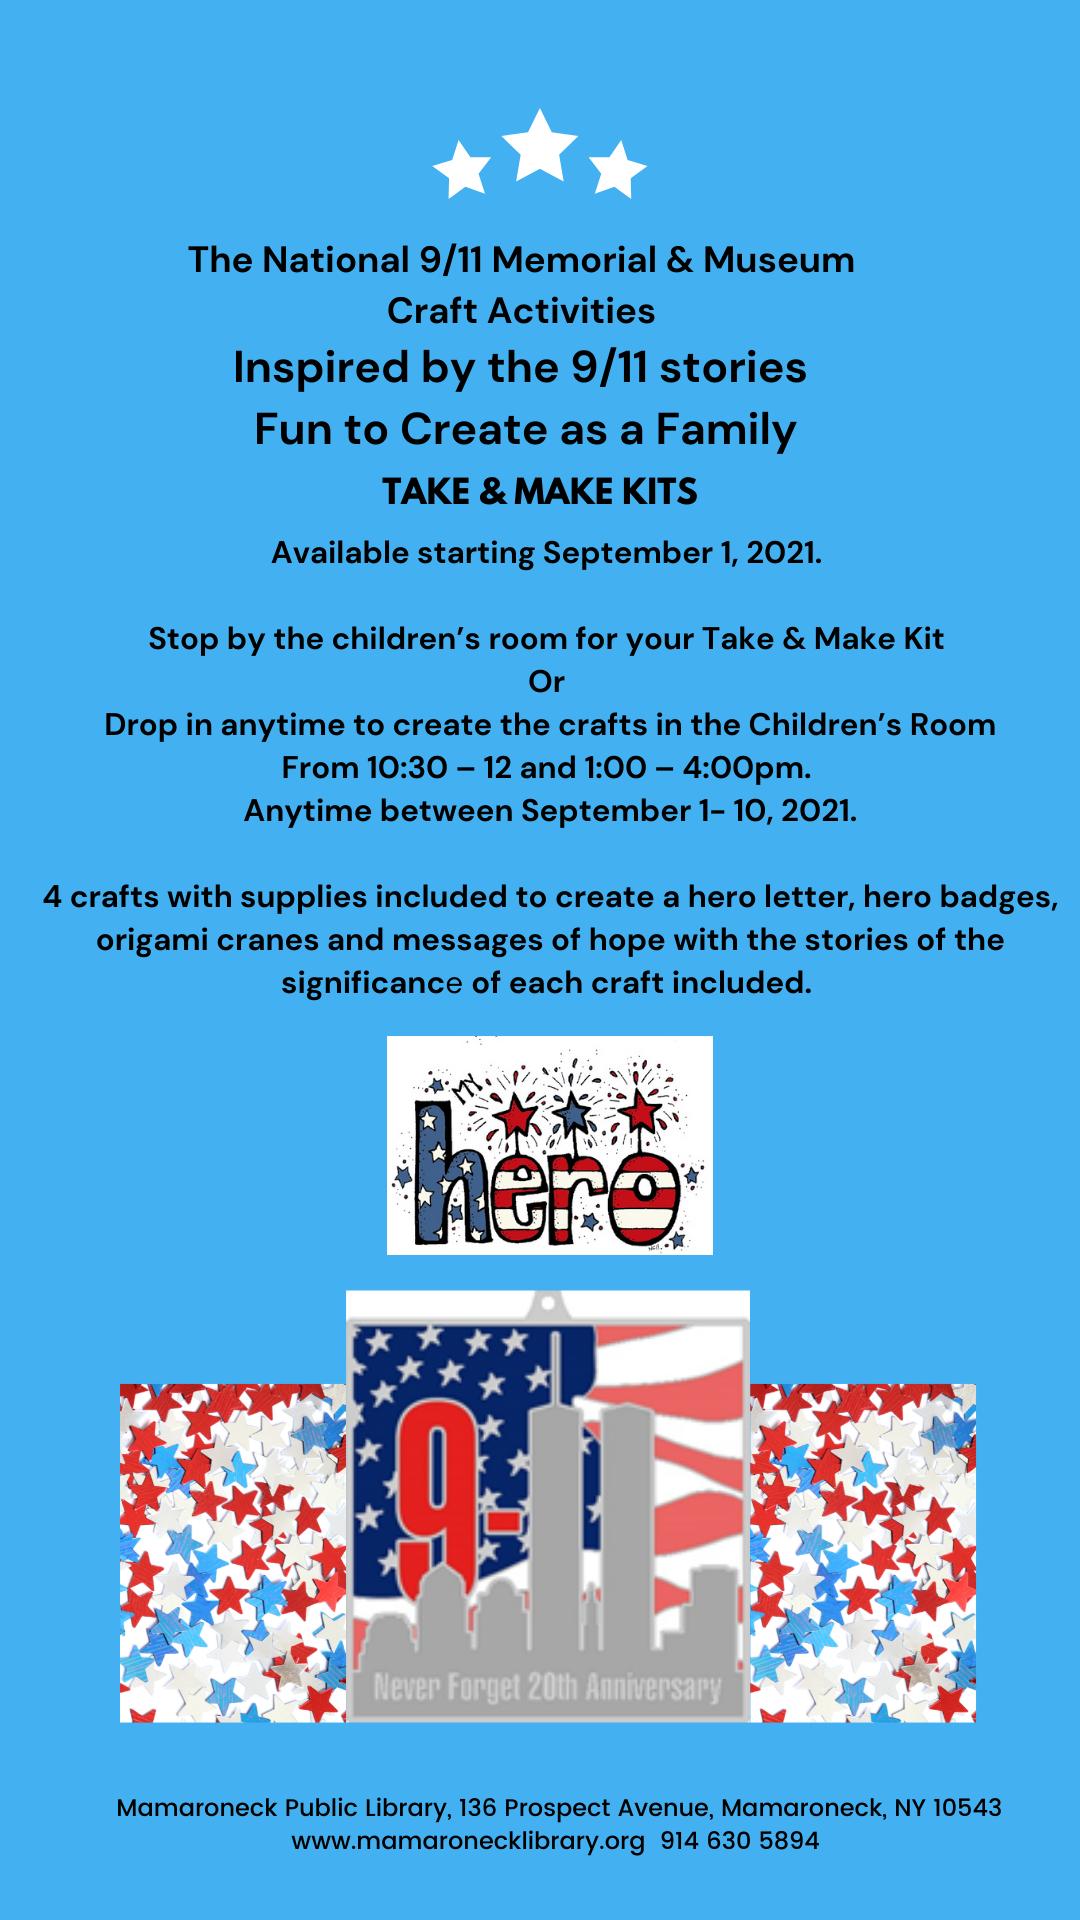 9/11 take and make kits for children